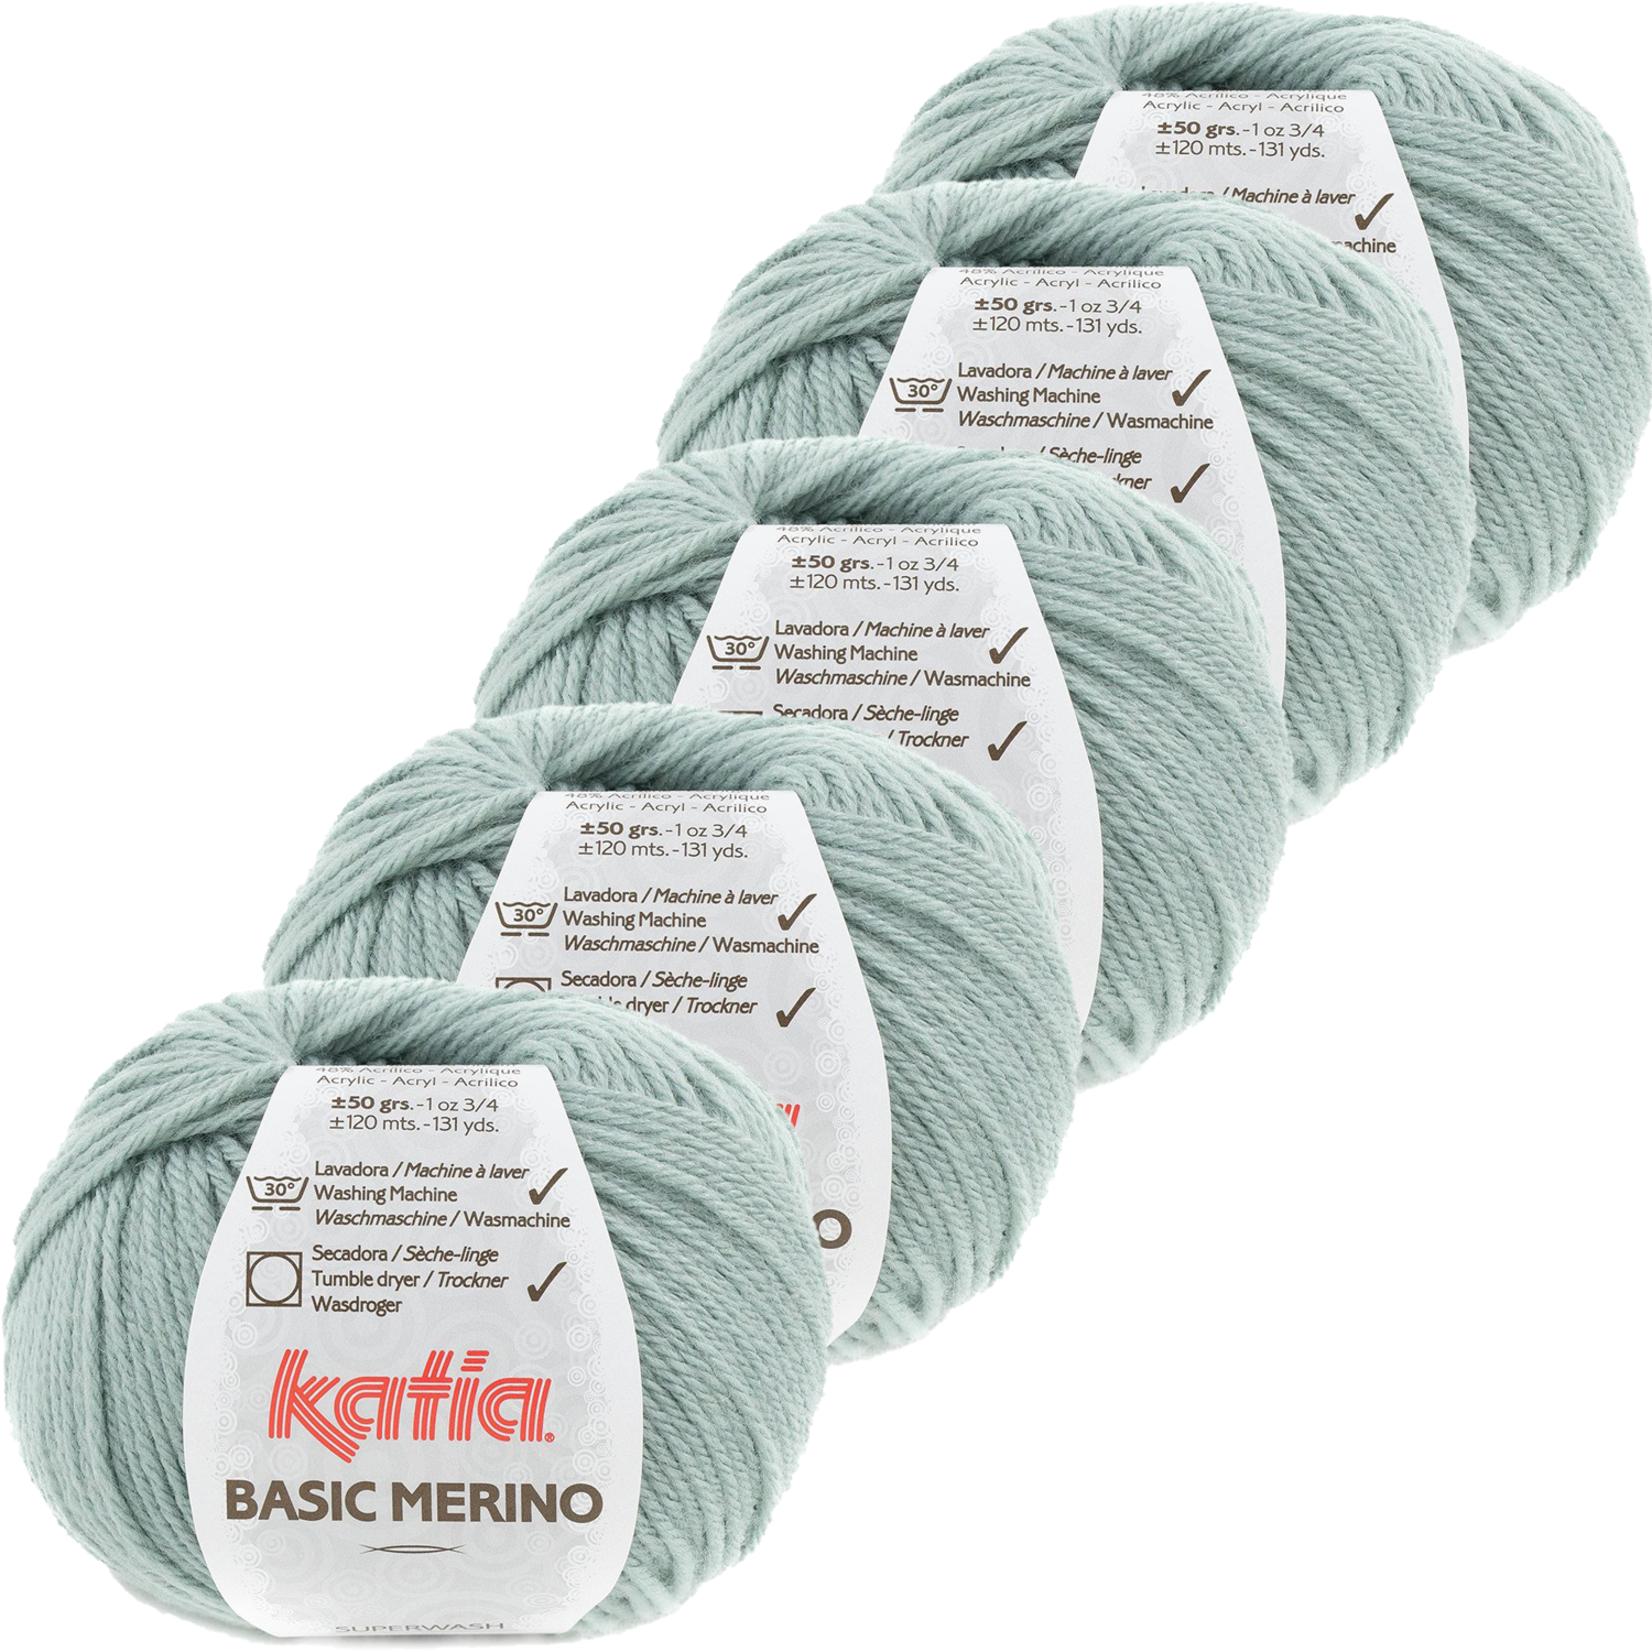 Katia Basic Merino - kleur 80_Witgroen - bundel 5 bollen 50 gr.  van 120 m.